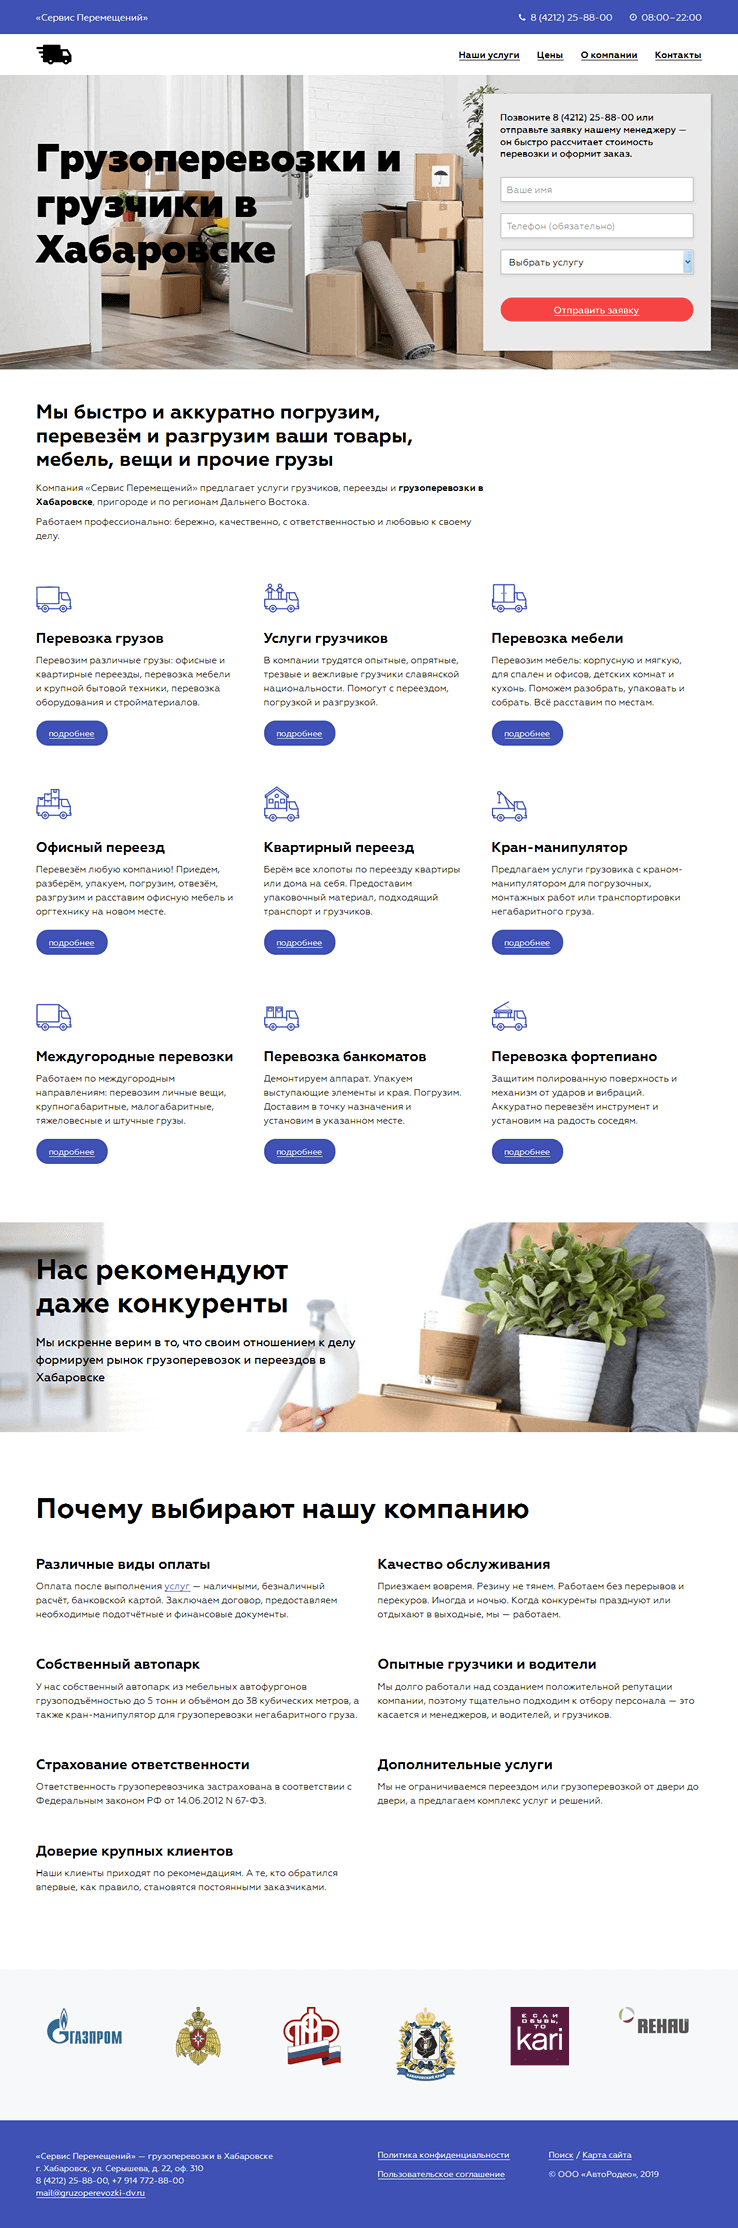 Сайт компании Сервис Перемещений